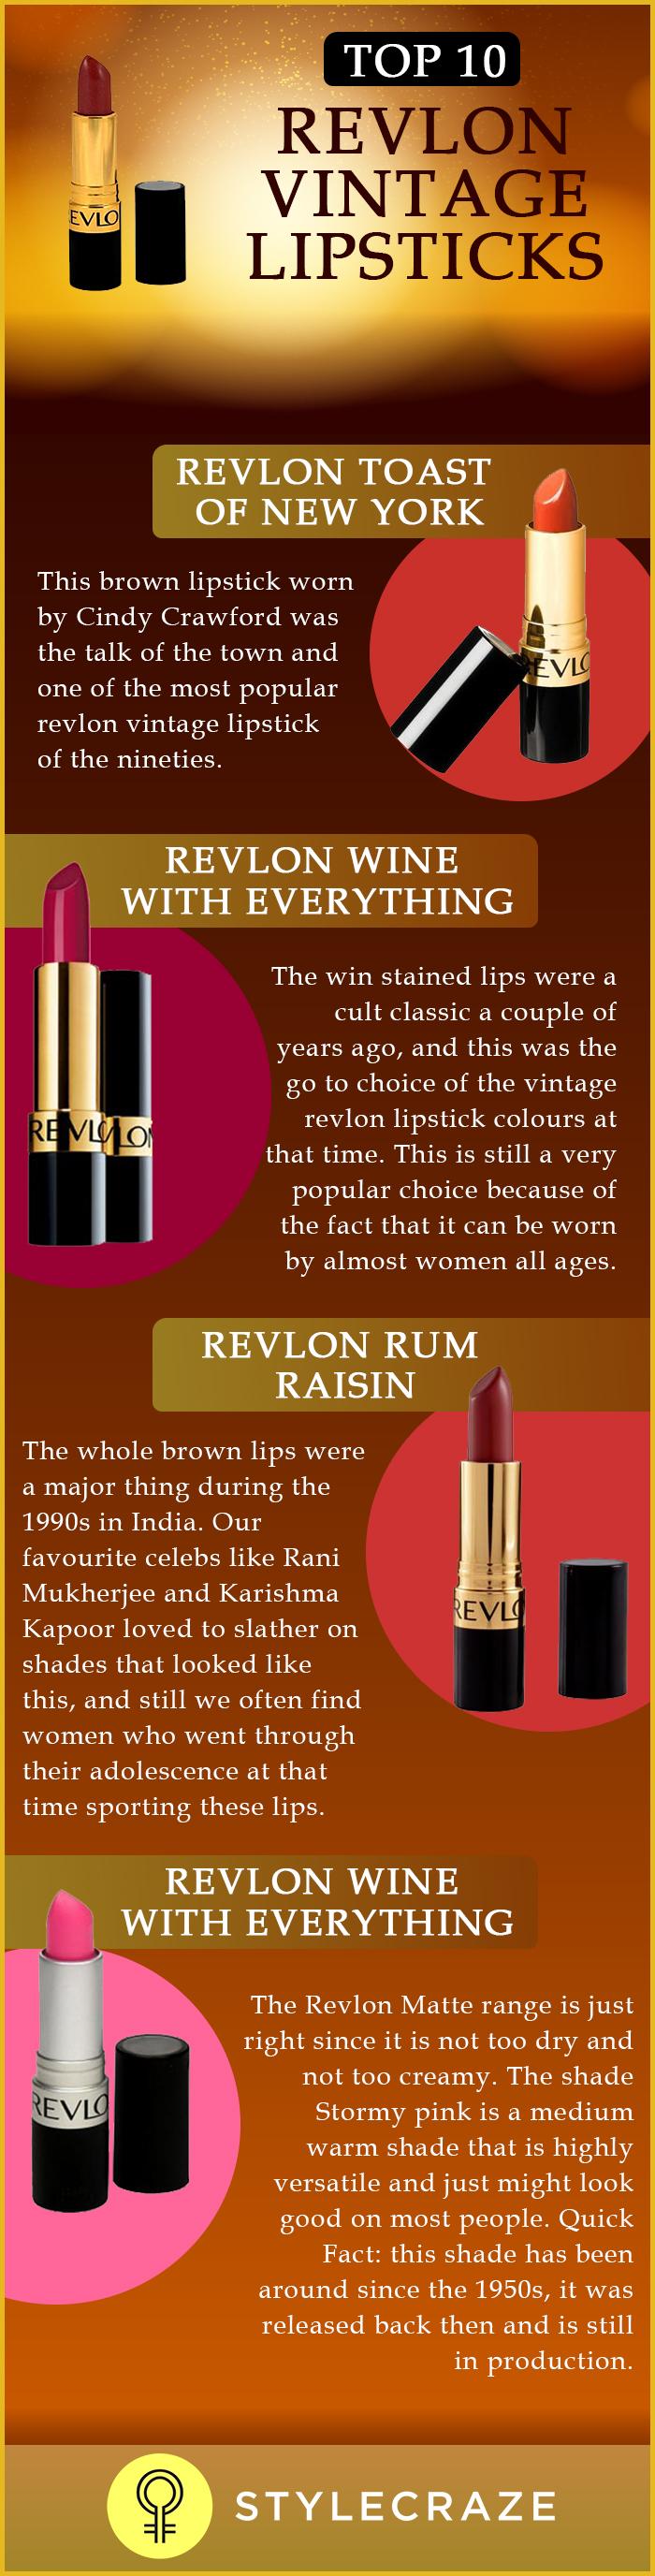 Top 10 Revlon Vintage Lipsticks